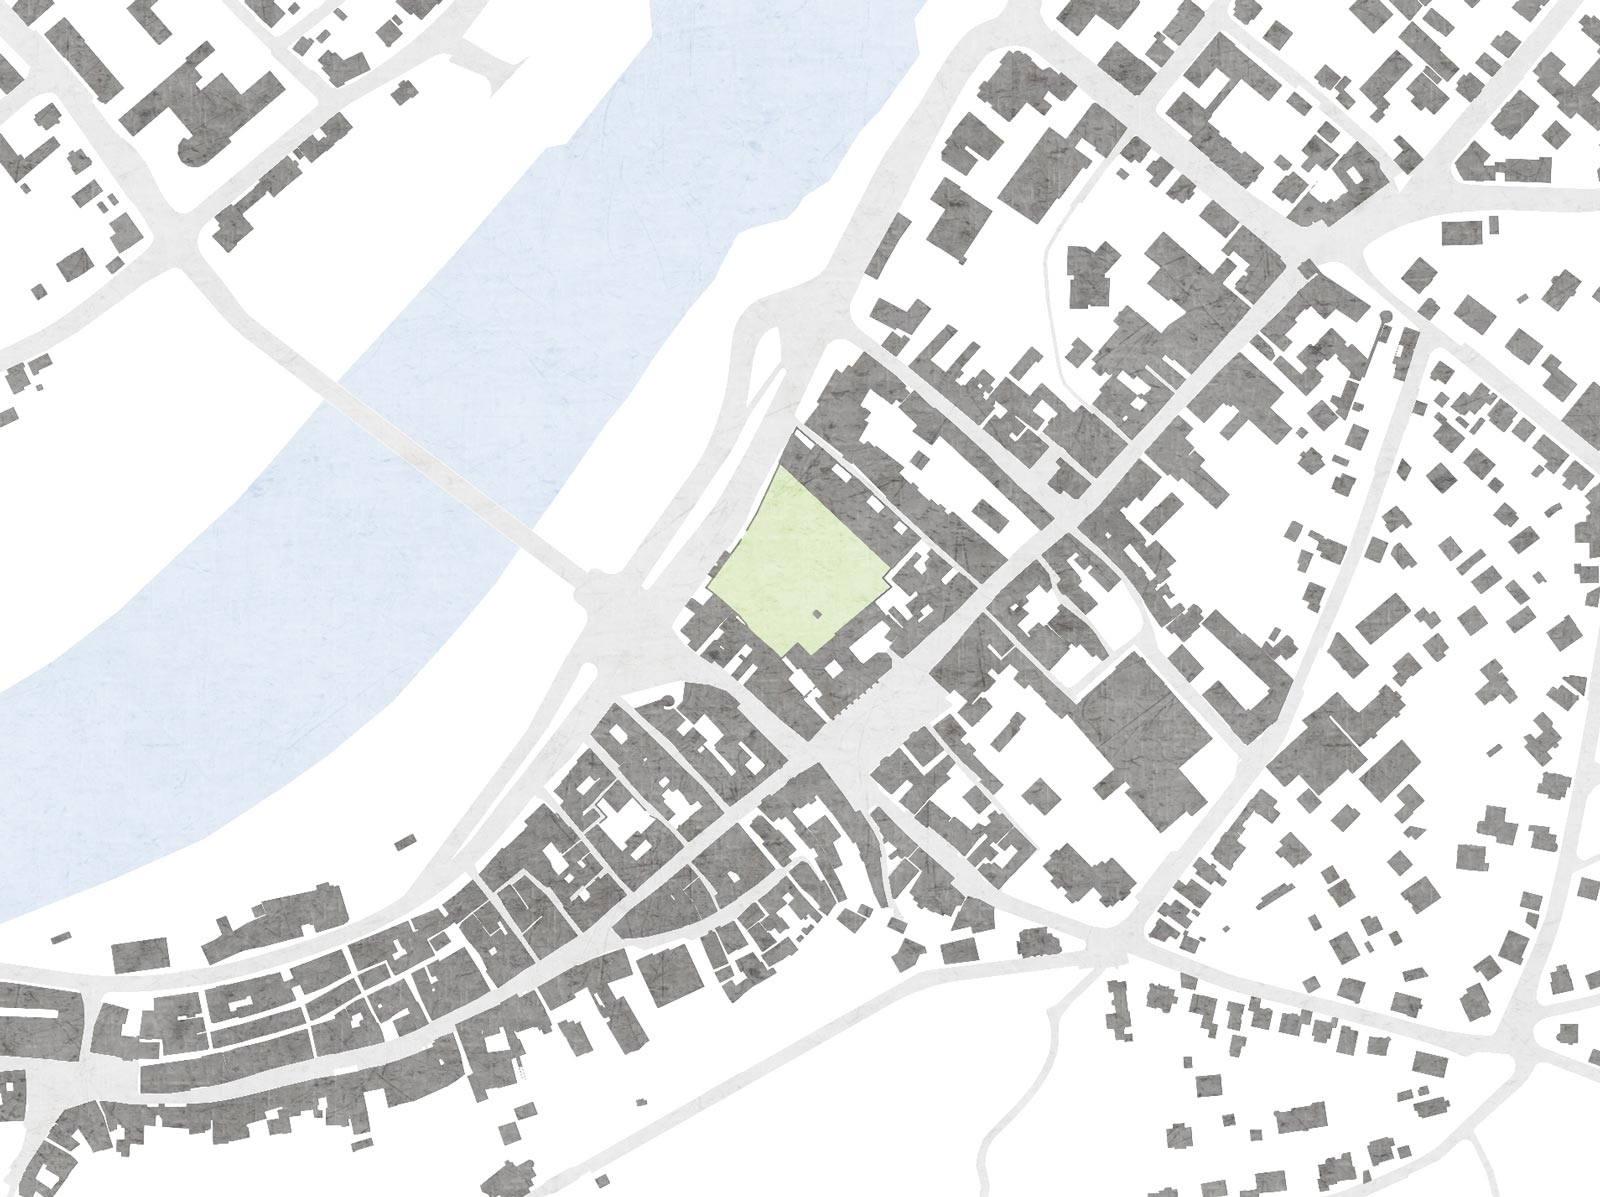 STUDIOKUBIK-KUBIK-architektur-architecture-berlin-KFM-lageplan